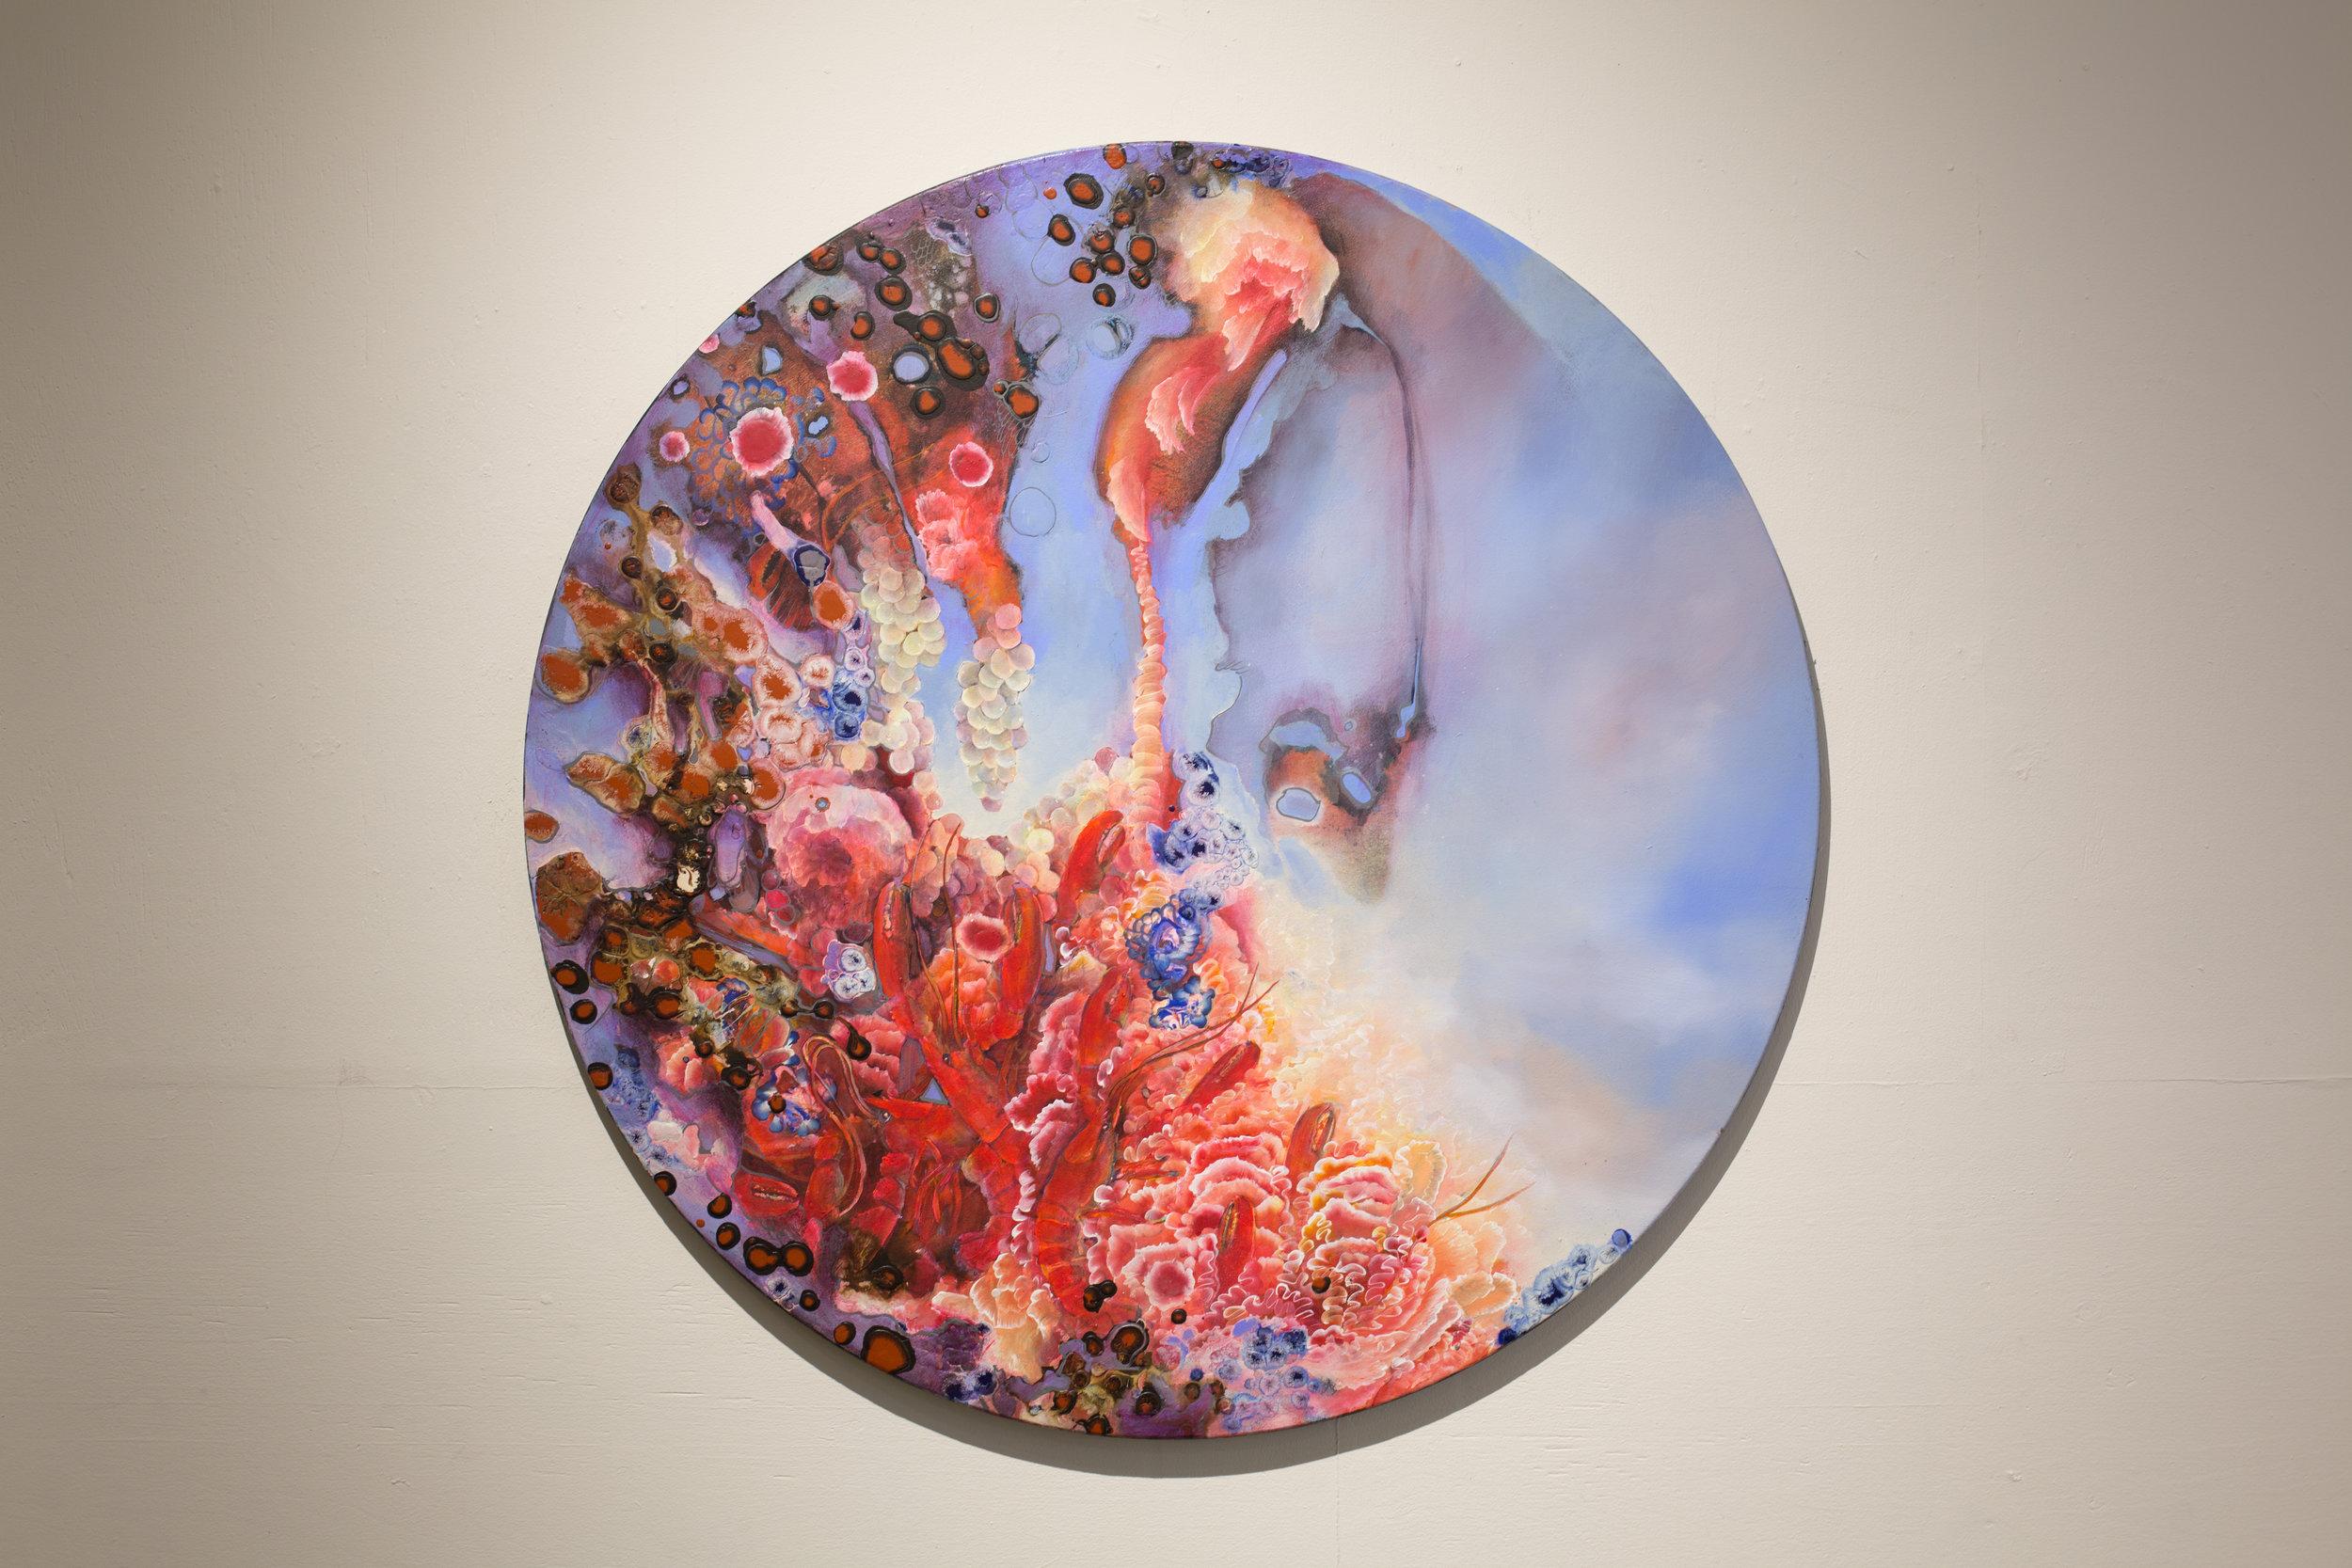 "Lobster, Acrylic on Canvas, 47"" Diameter, 2018. $3100.00"